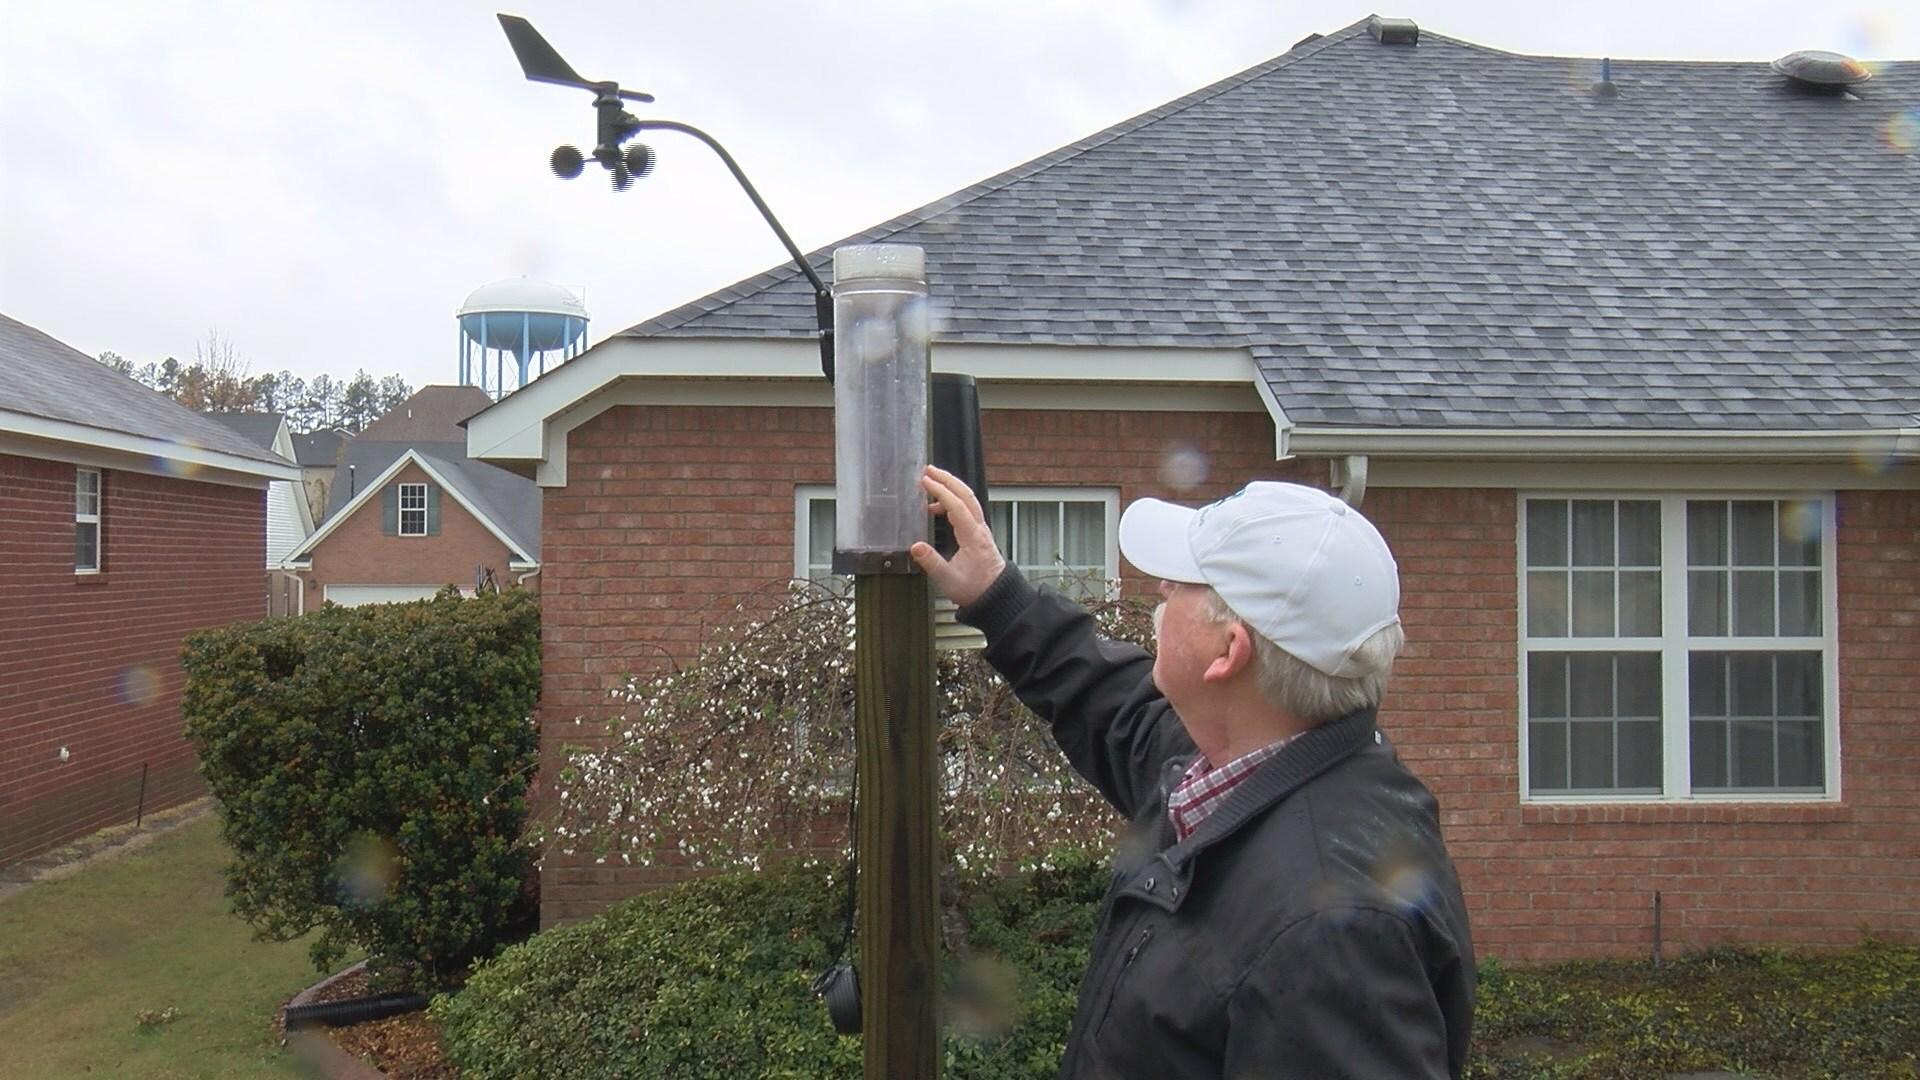 CoCoRaHS volunteer Richard Cutright checks the rain gauge behind his home in Grovetown, GA. (WFXG)